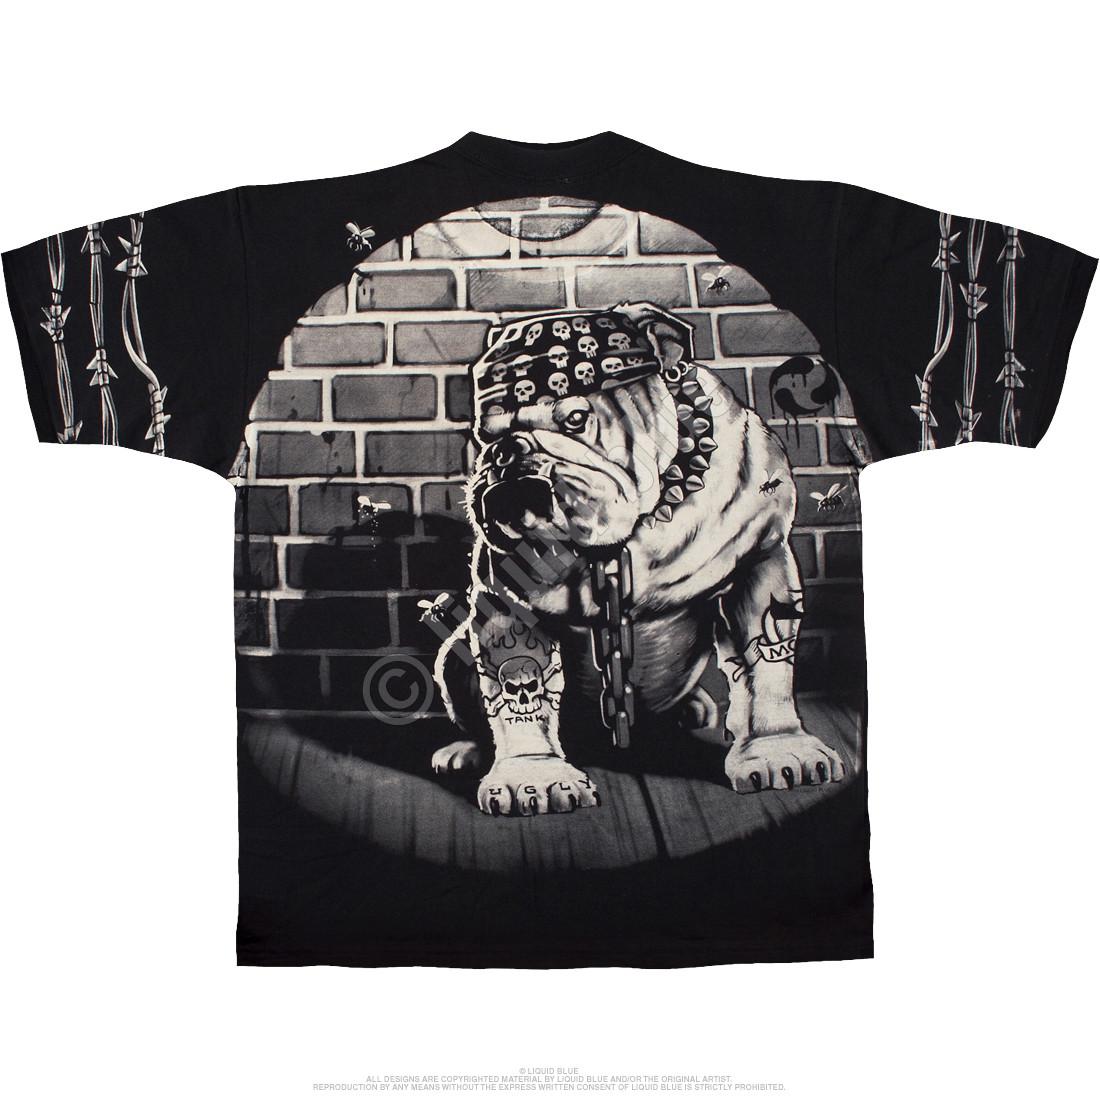 Cats Suck Bulldog Black T-Shirt